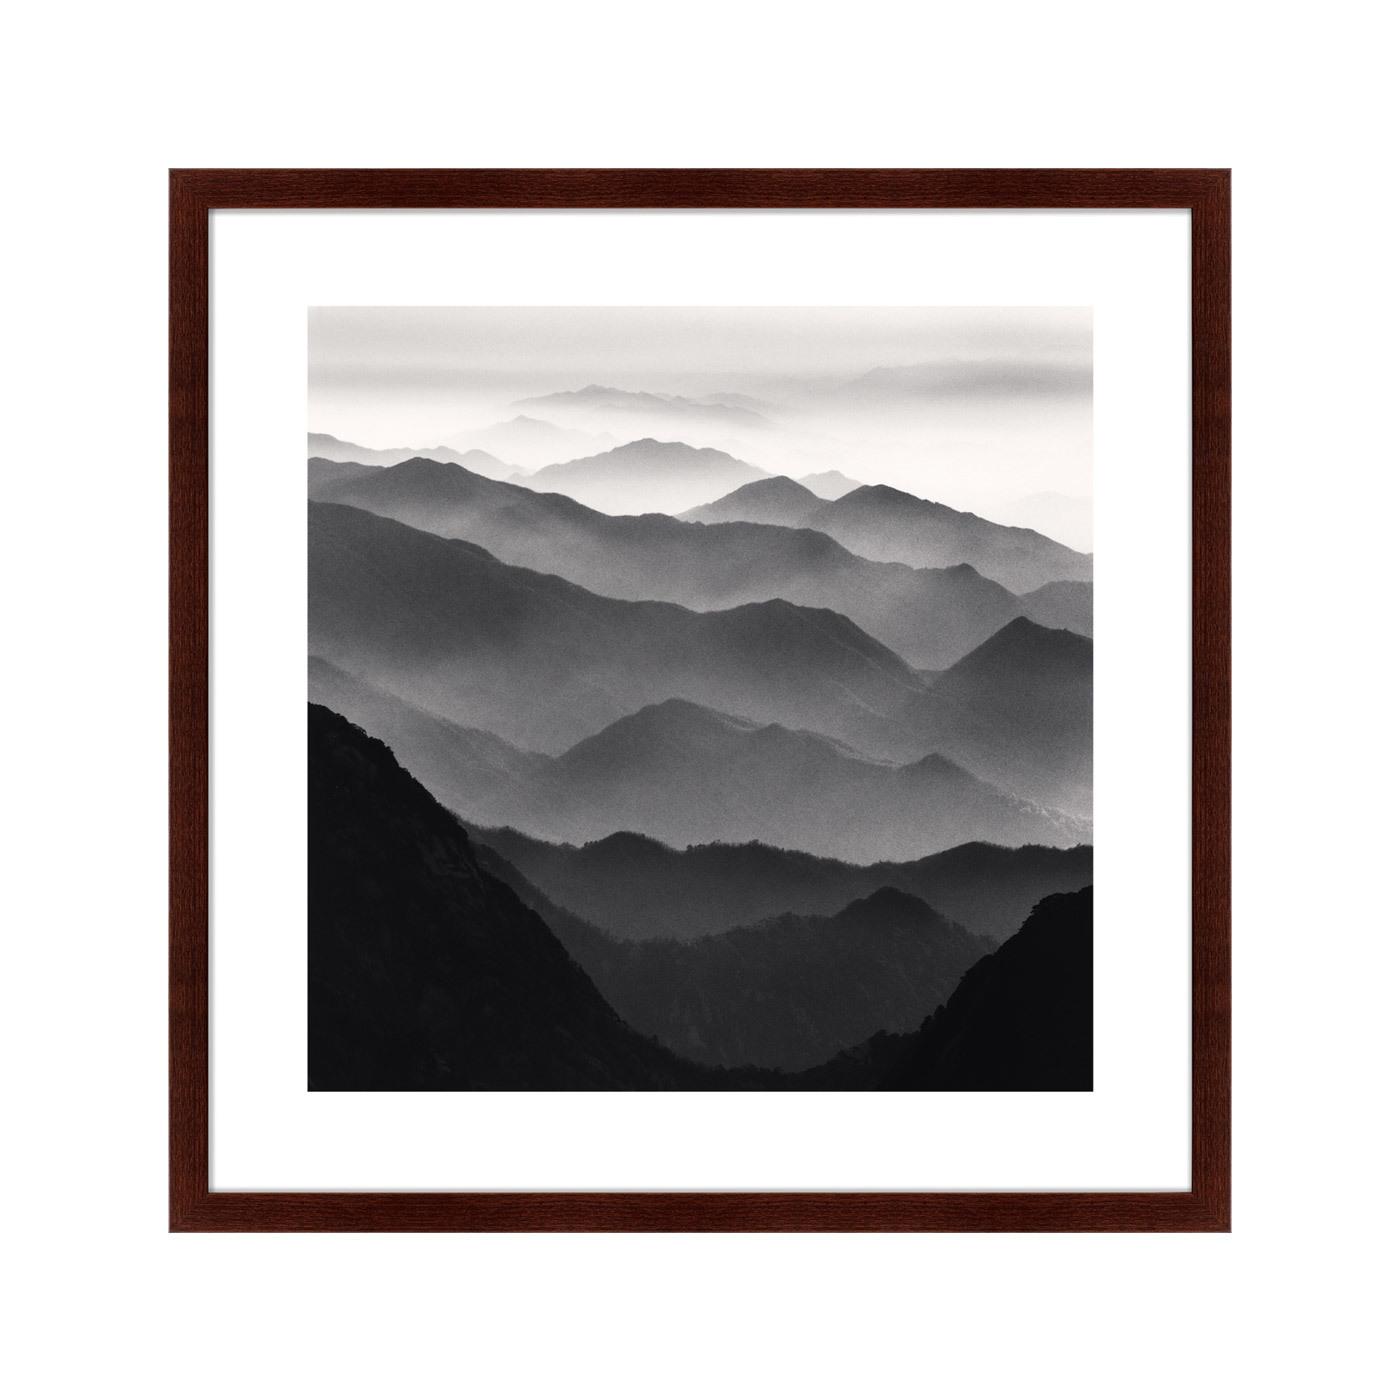 {} Картины в Квартиру Картина Huangshan Mountains (79х79 см) картины в квартиру картина etude 2 102х130 см